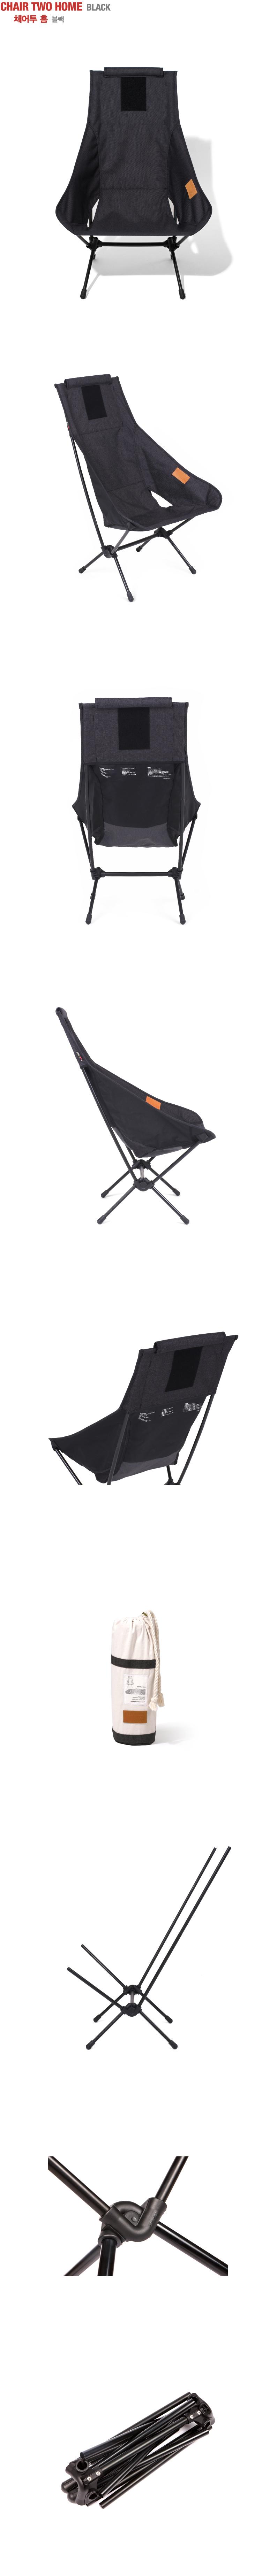 20170607-chair-two-black-상세페이지.jpg